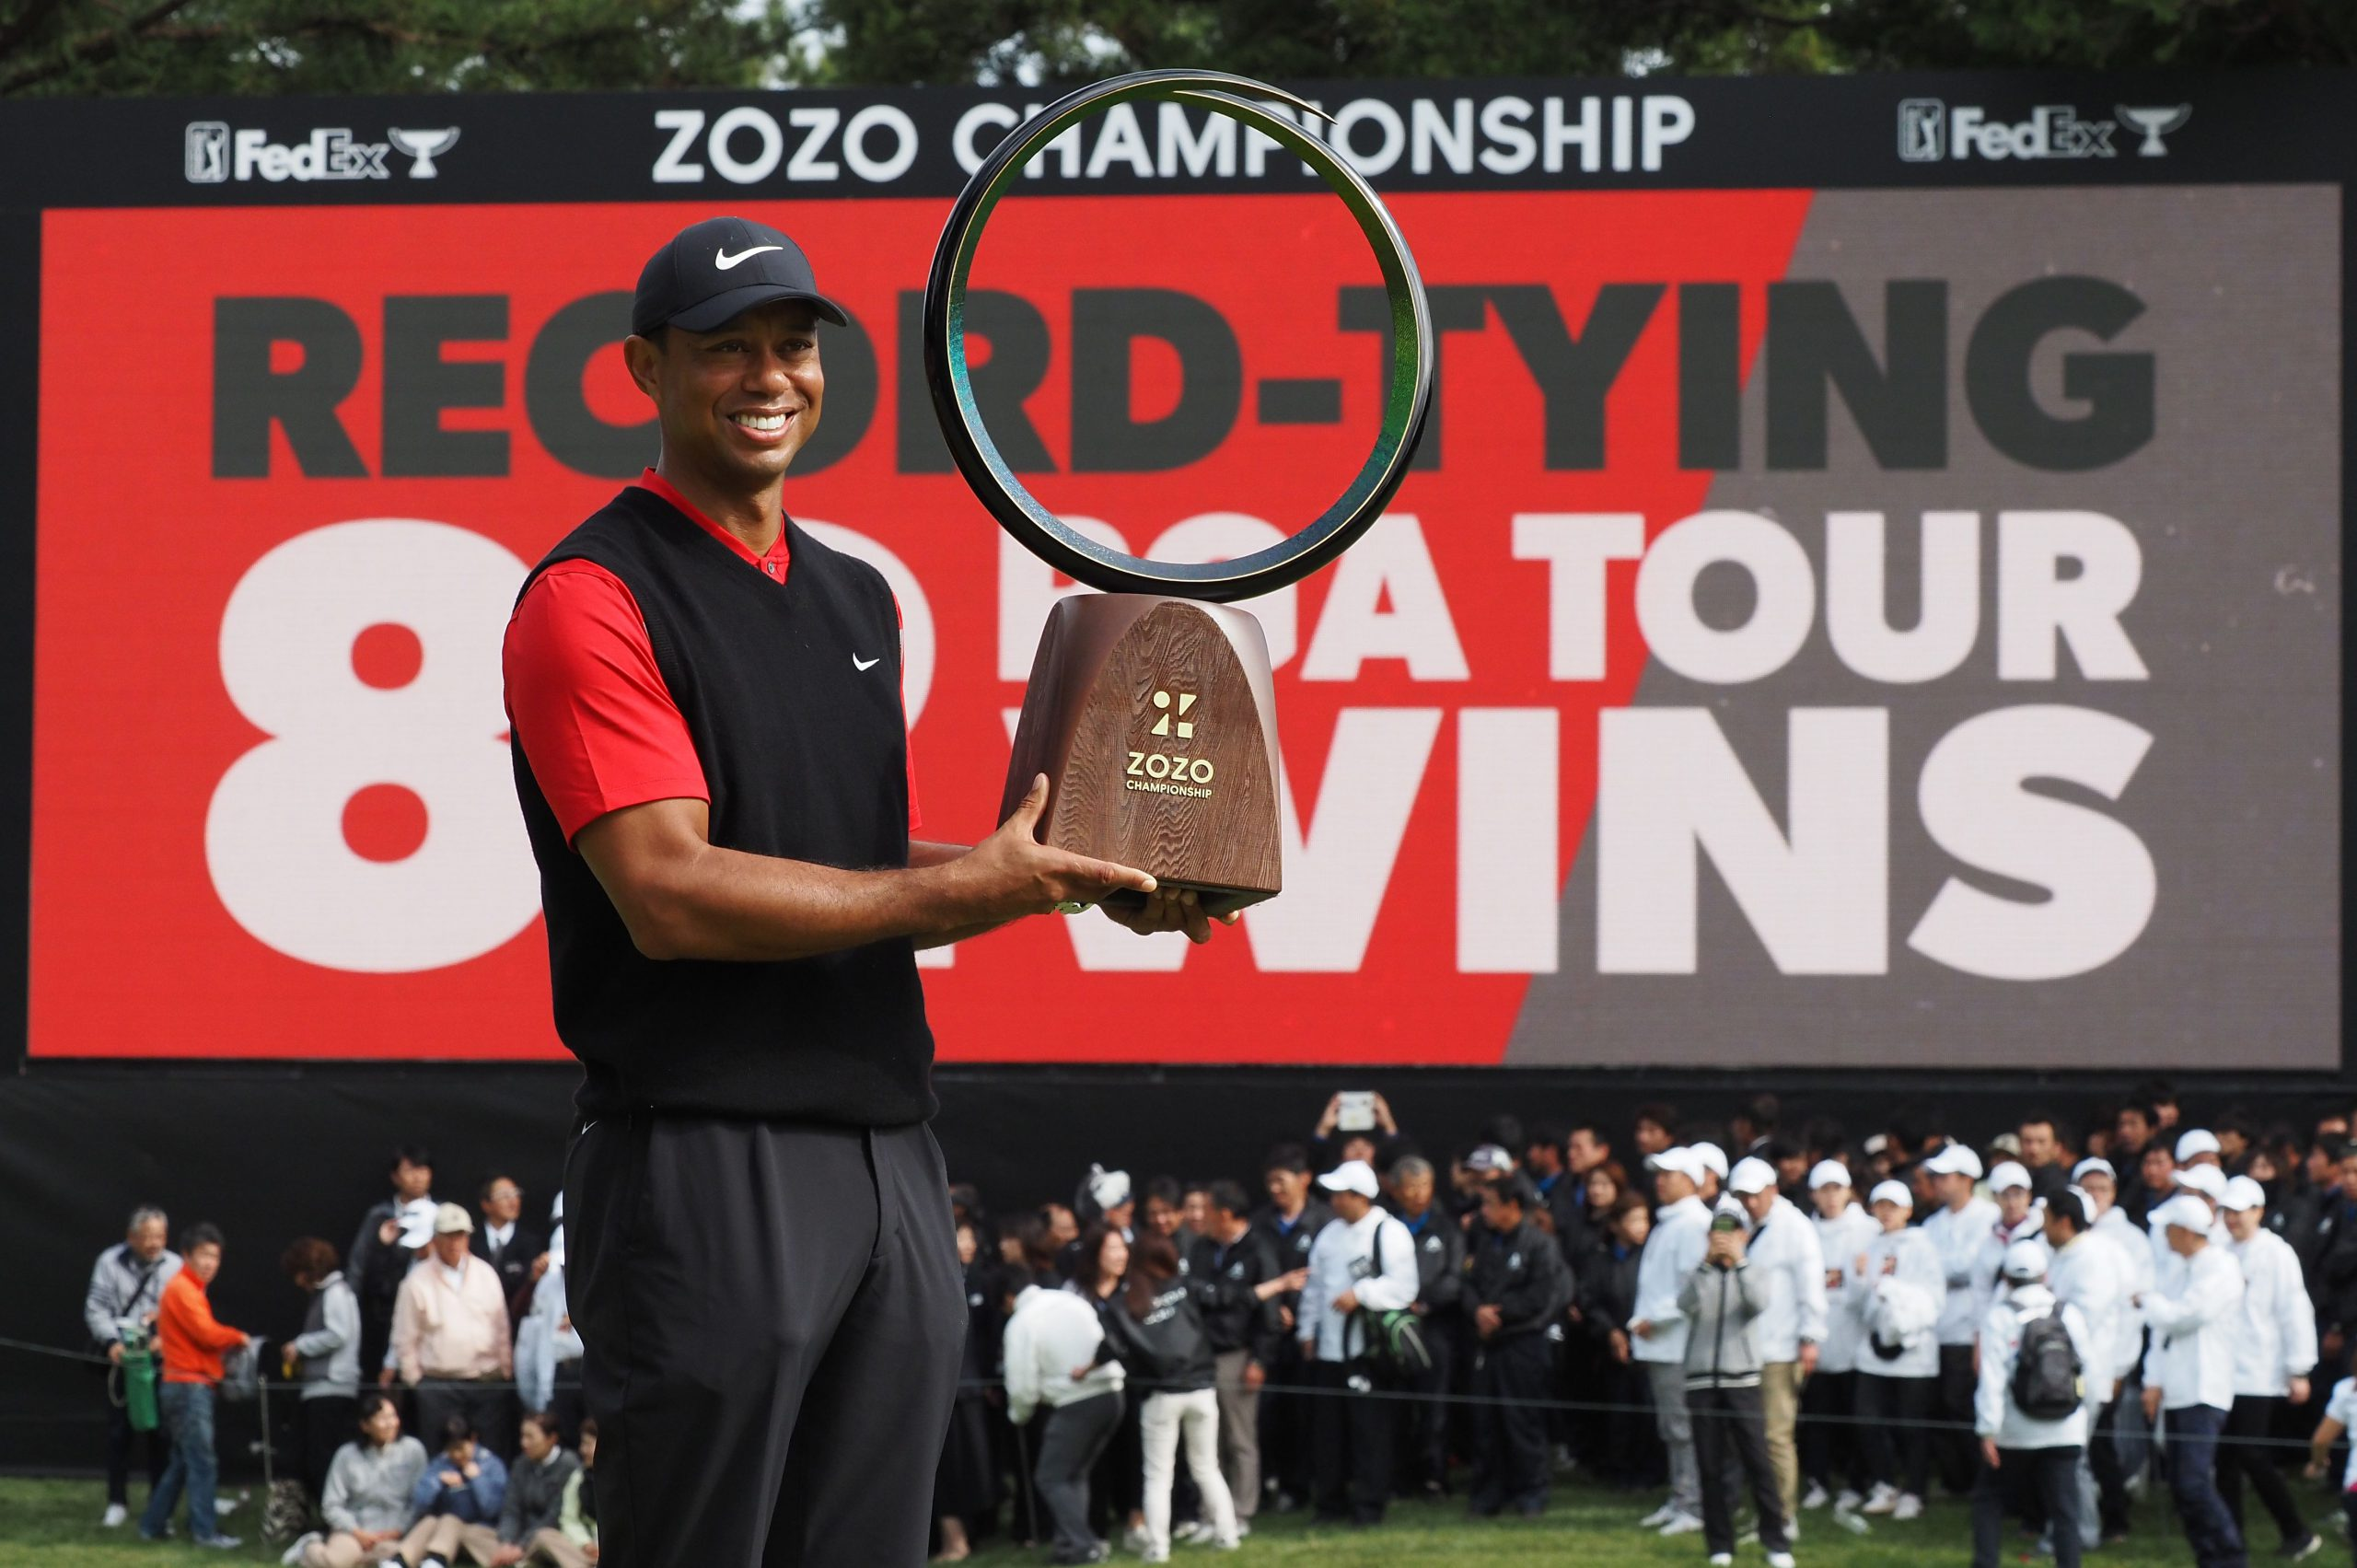 Tiger Woods captures 82nd PGA TOUR victory